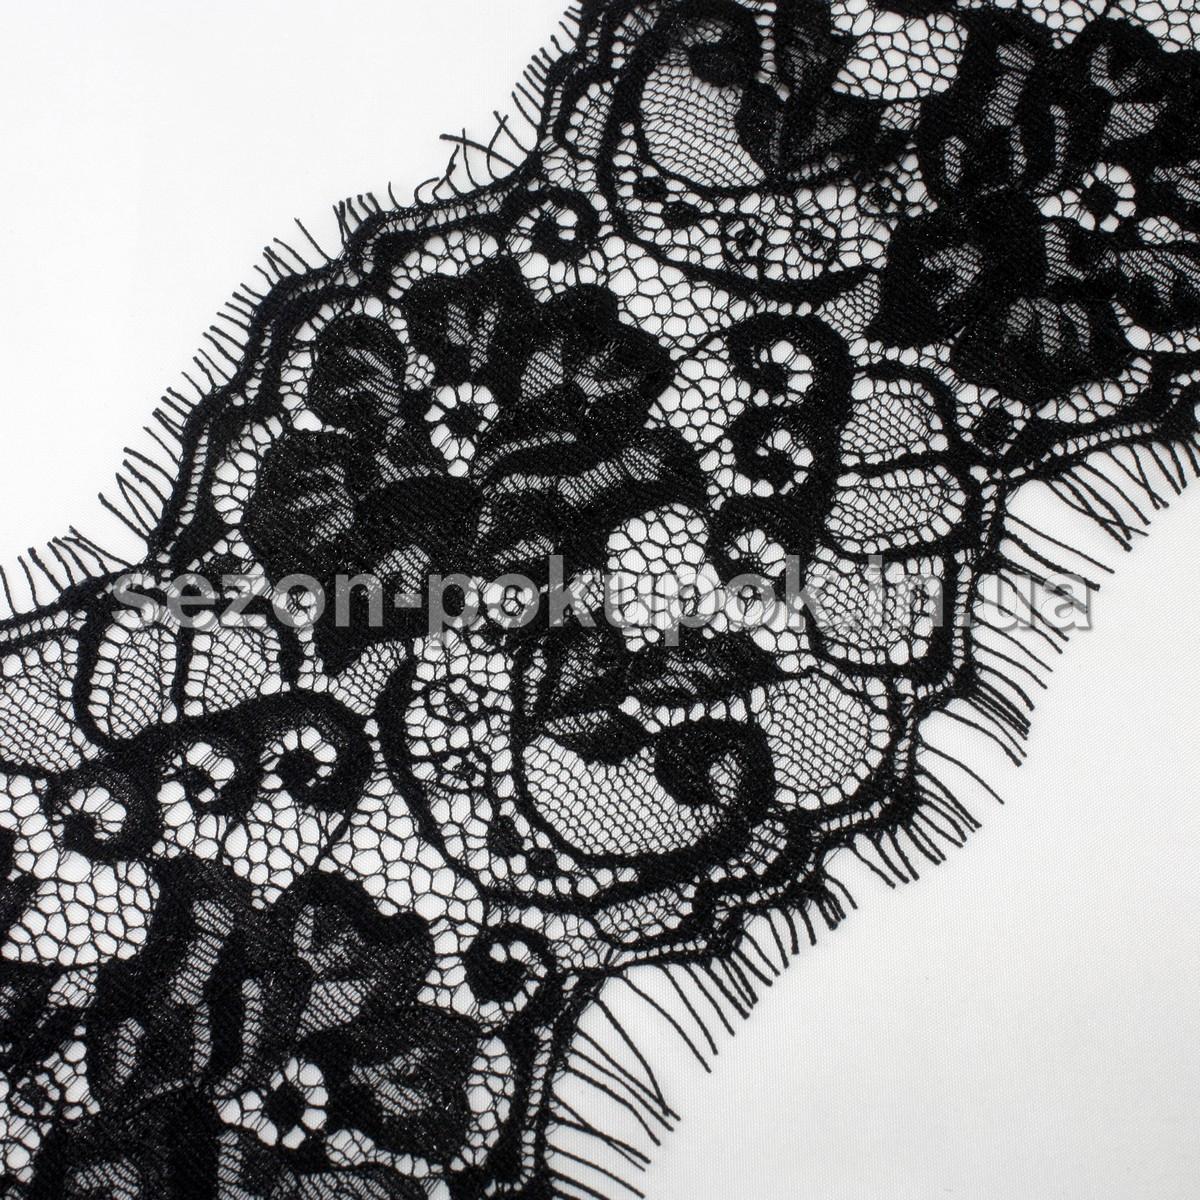 (3 метра)Французское кружево (Шантильи, с ресничками) ширина 12,5см (цена за 3 м). Цвет - черный